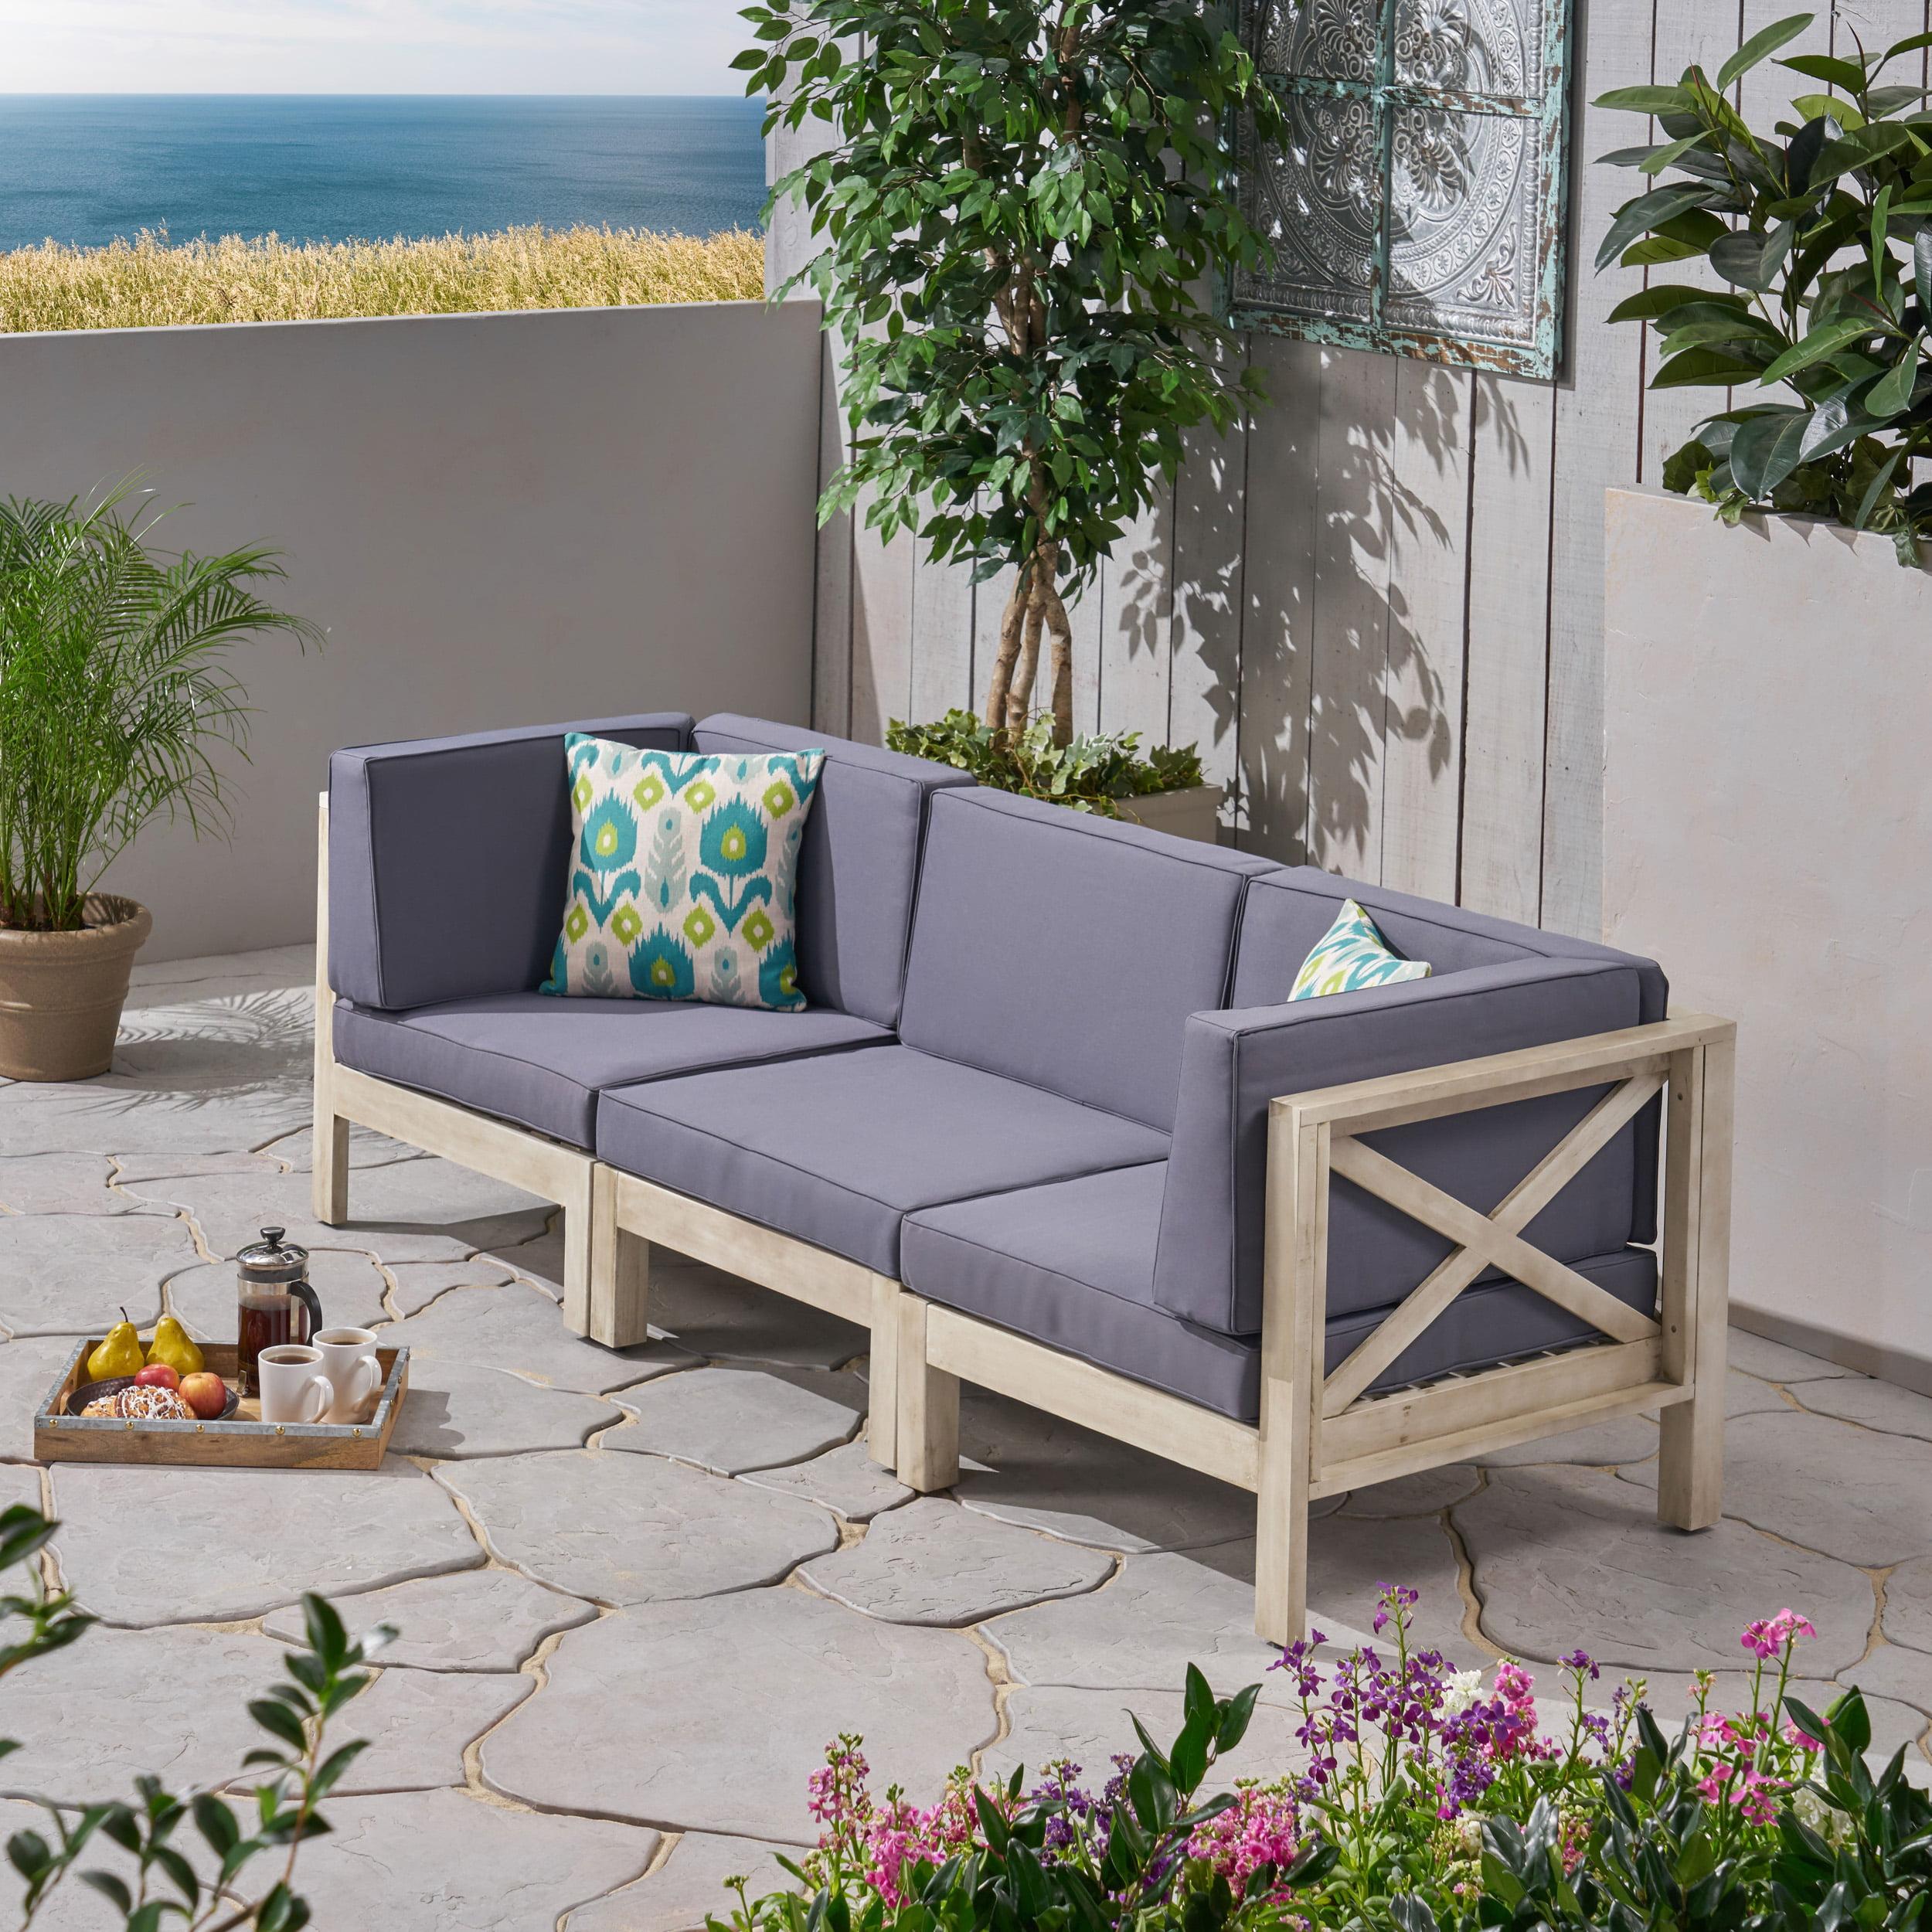 Elisha Outdoor Modular 3 Piece Acacia Wood Sectional Sofa Set with Cushions, Weathered Gray, Dark Gray